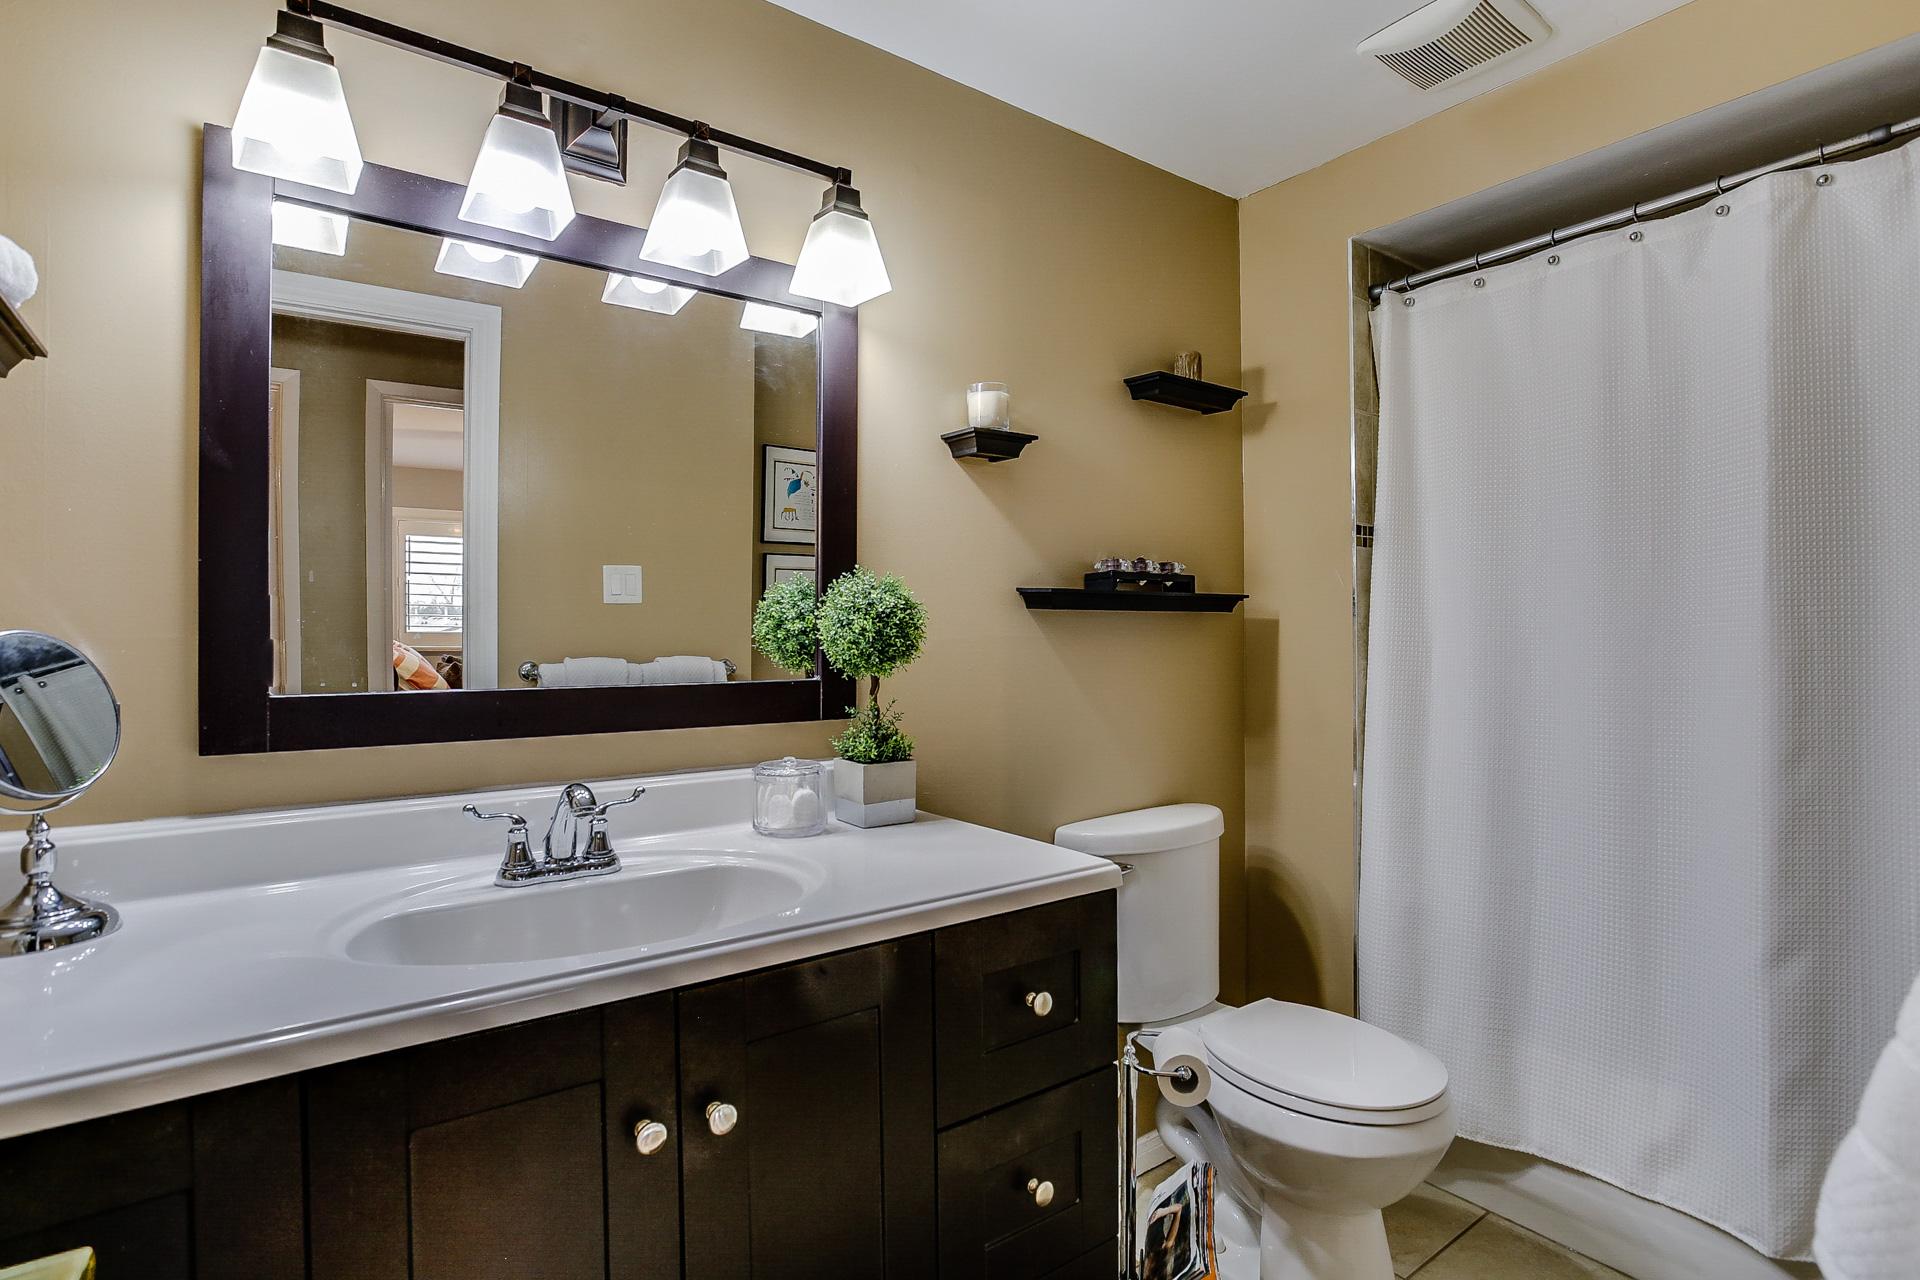 29_1stbathroom11.jpg